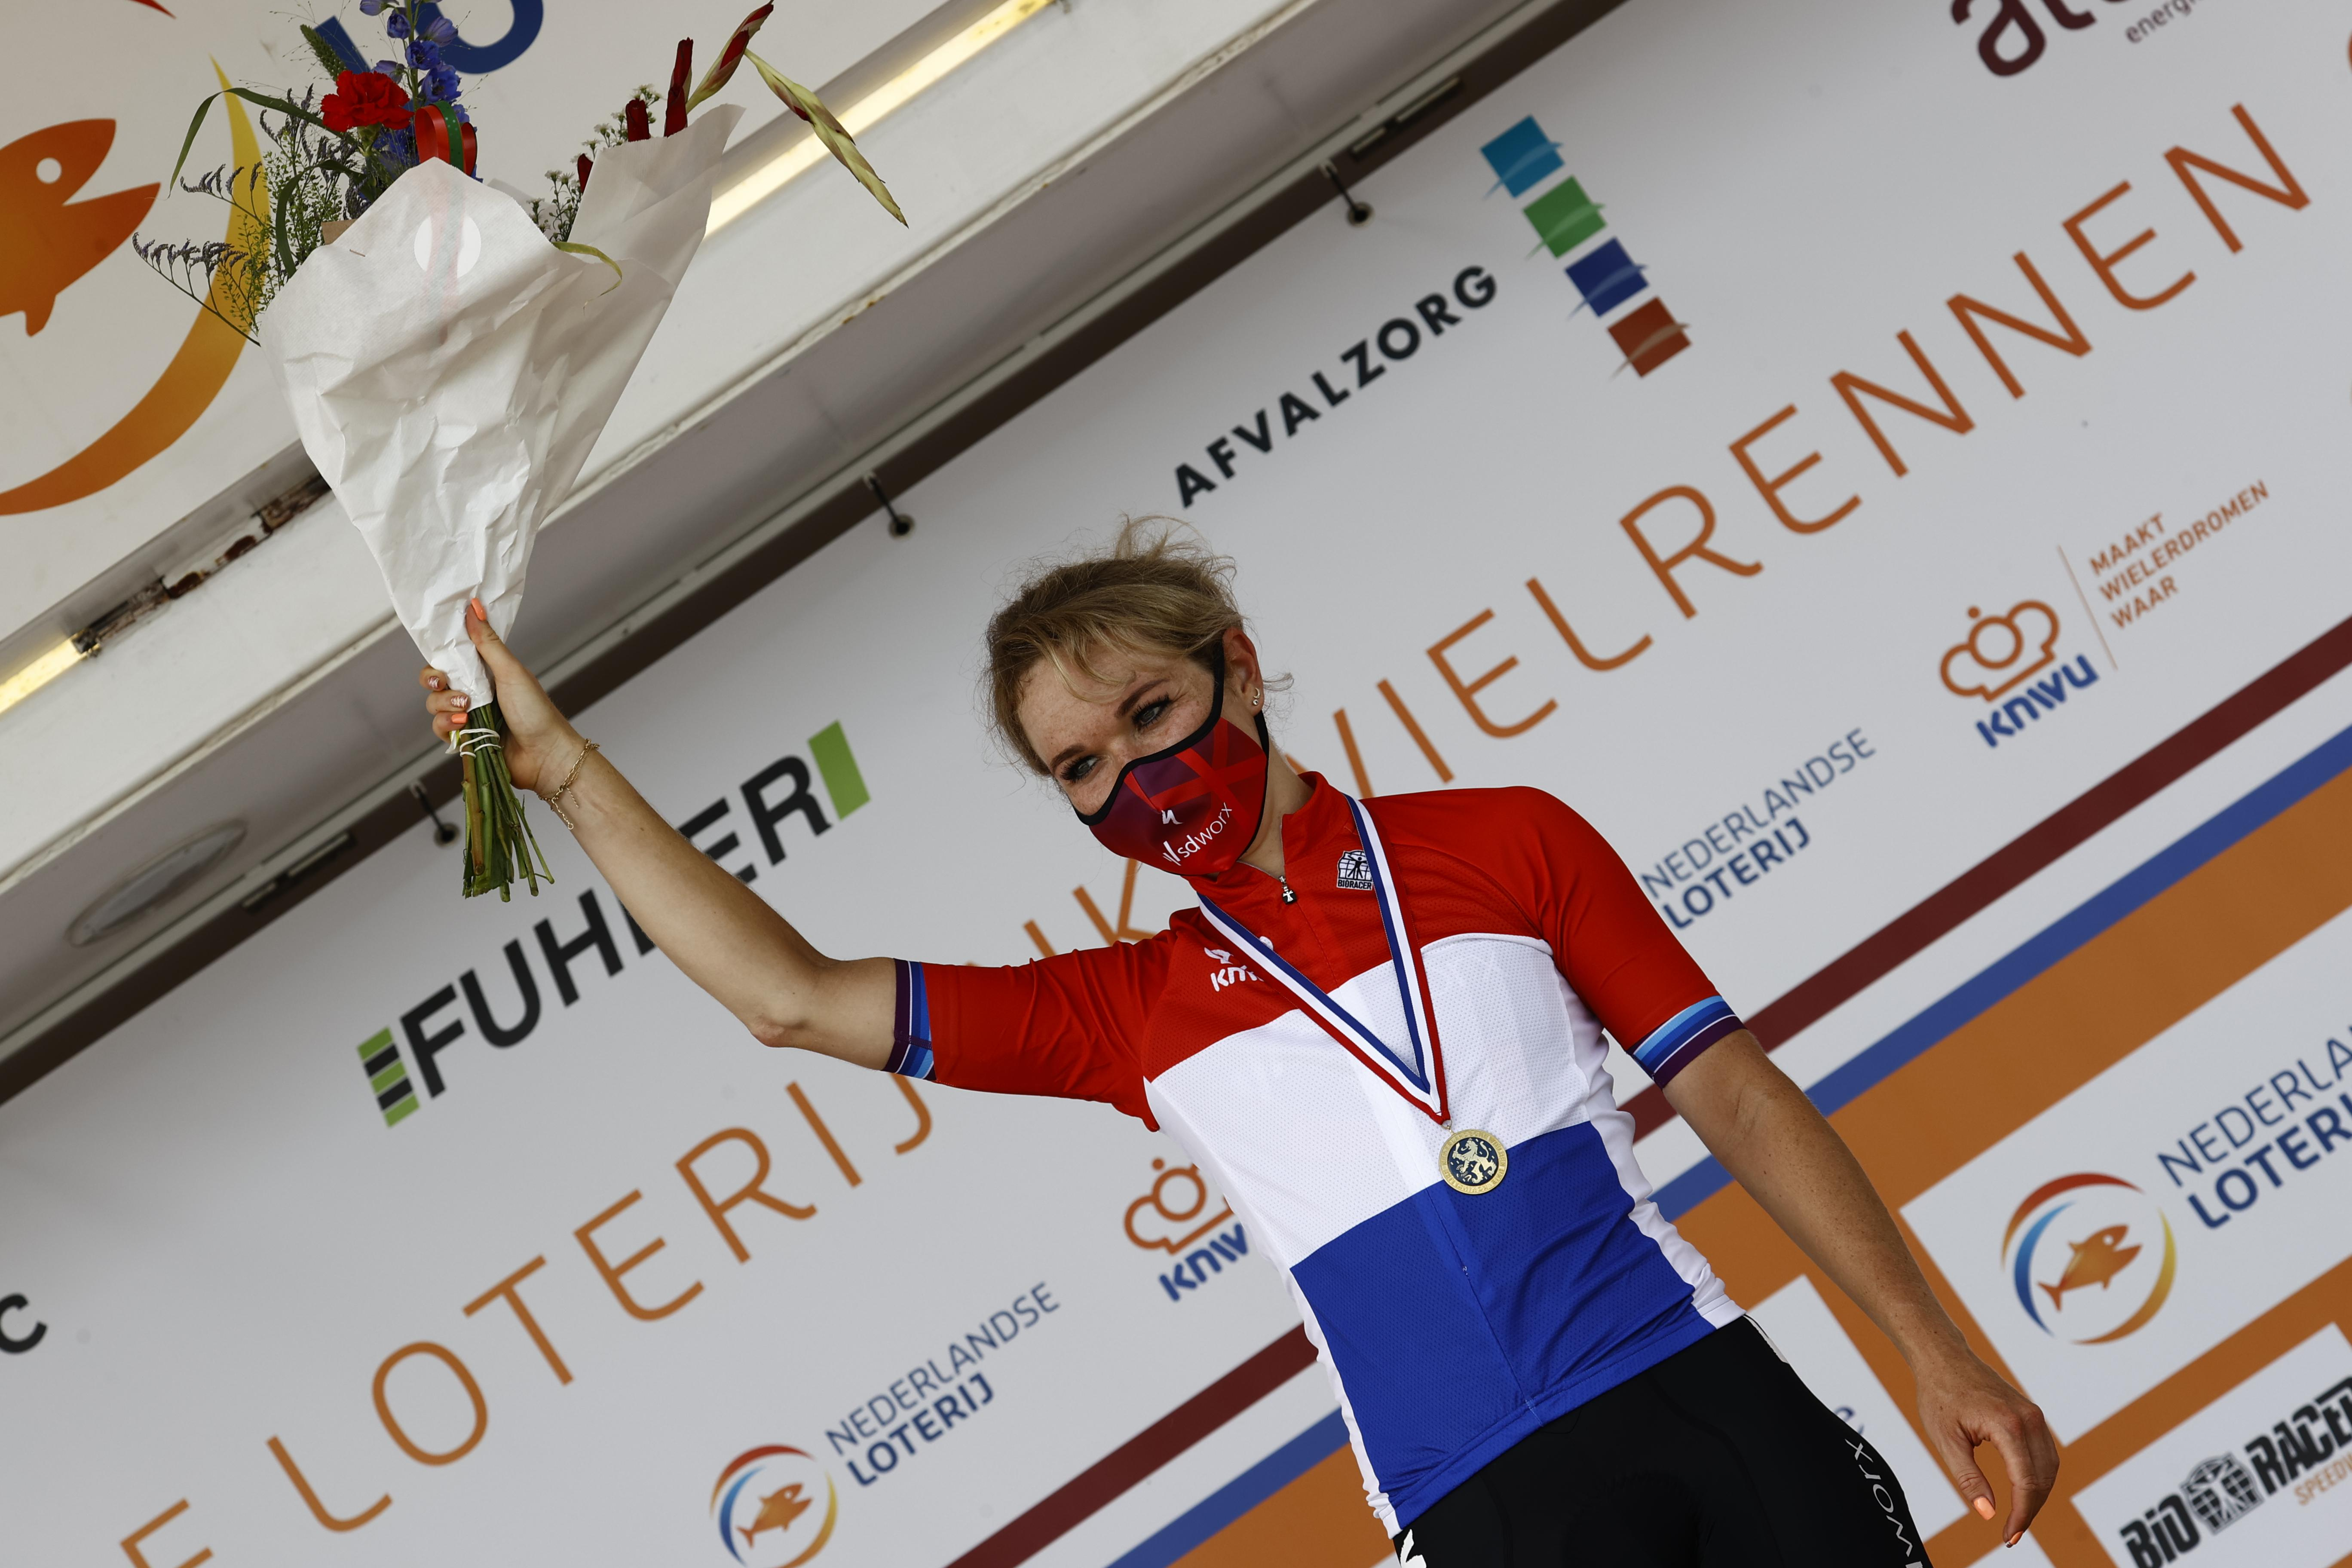 Wielrenster Amy Pieters wint Nederlandse titel op VAM-berg